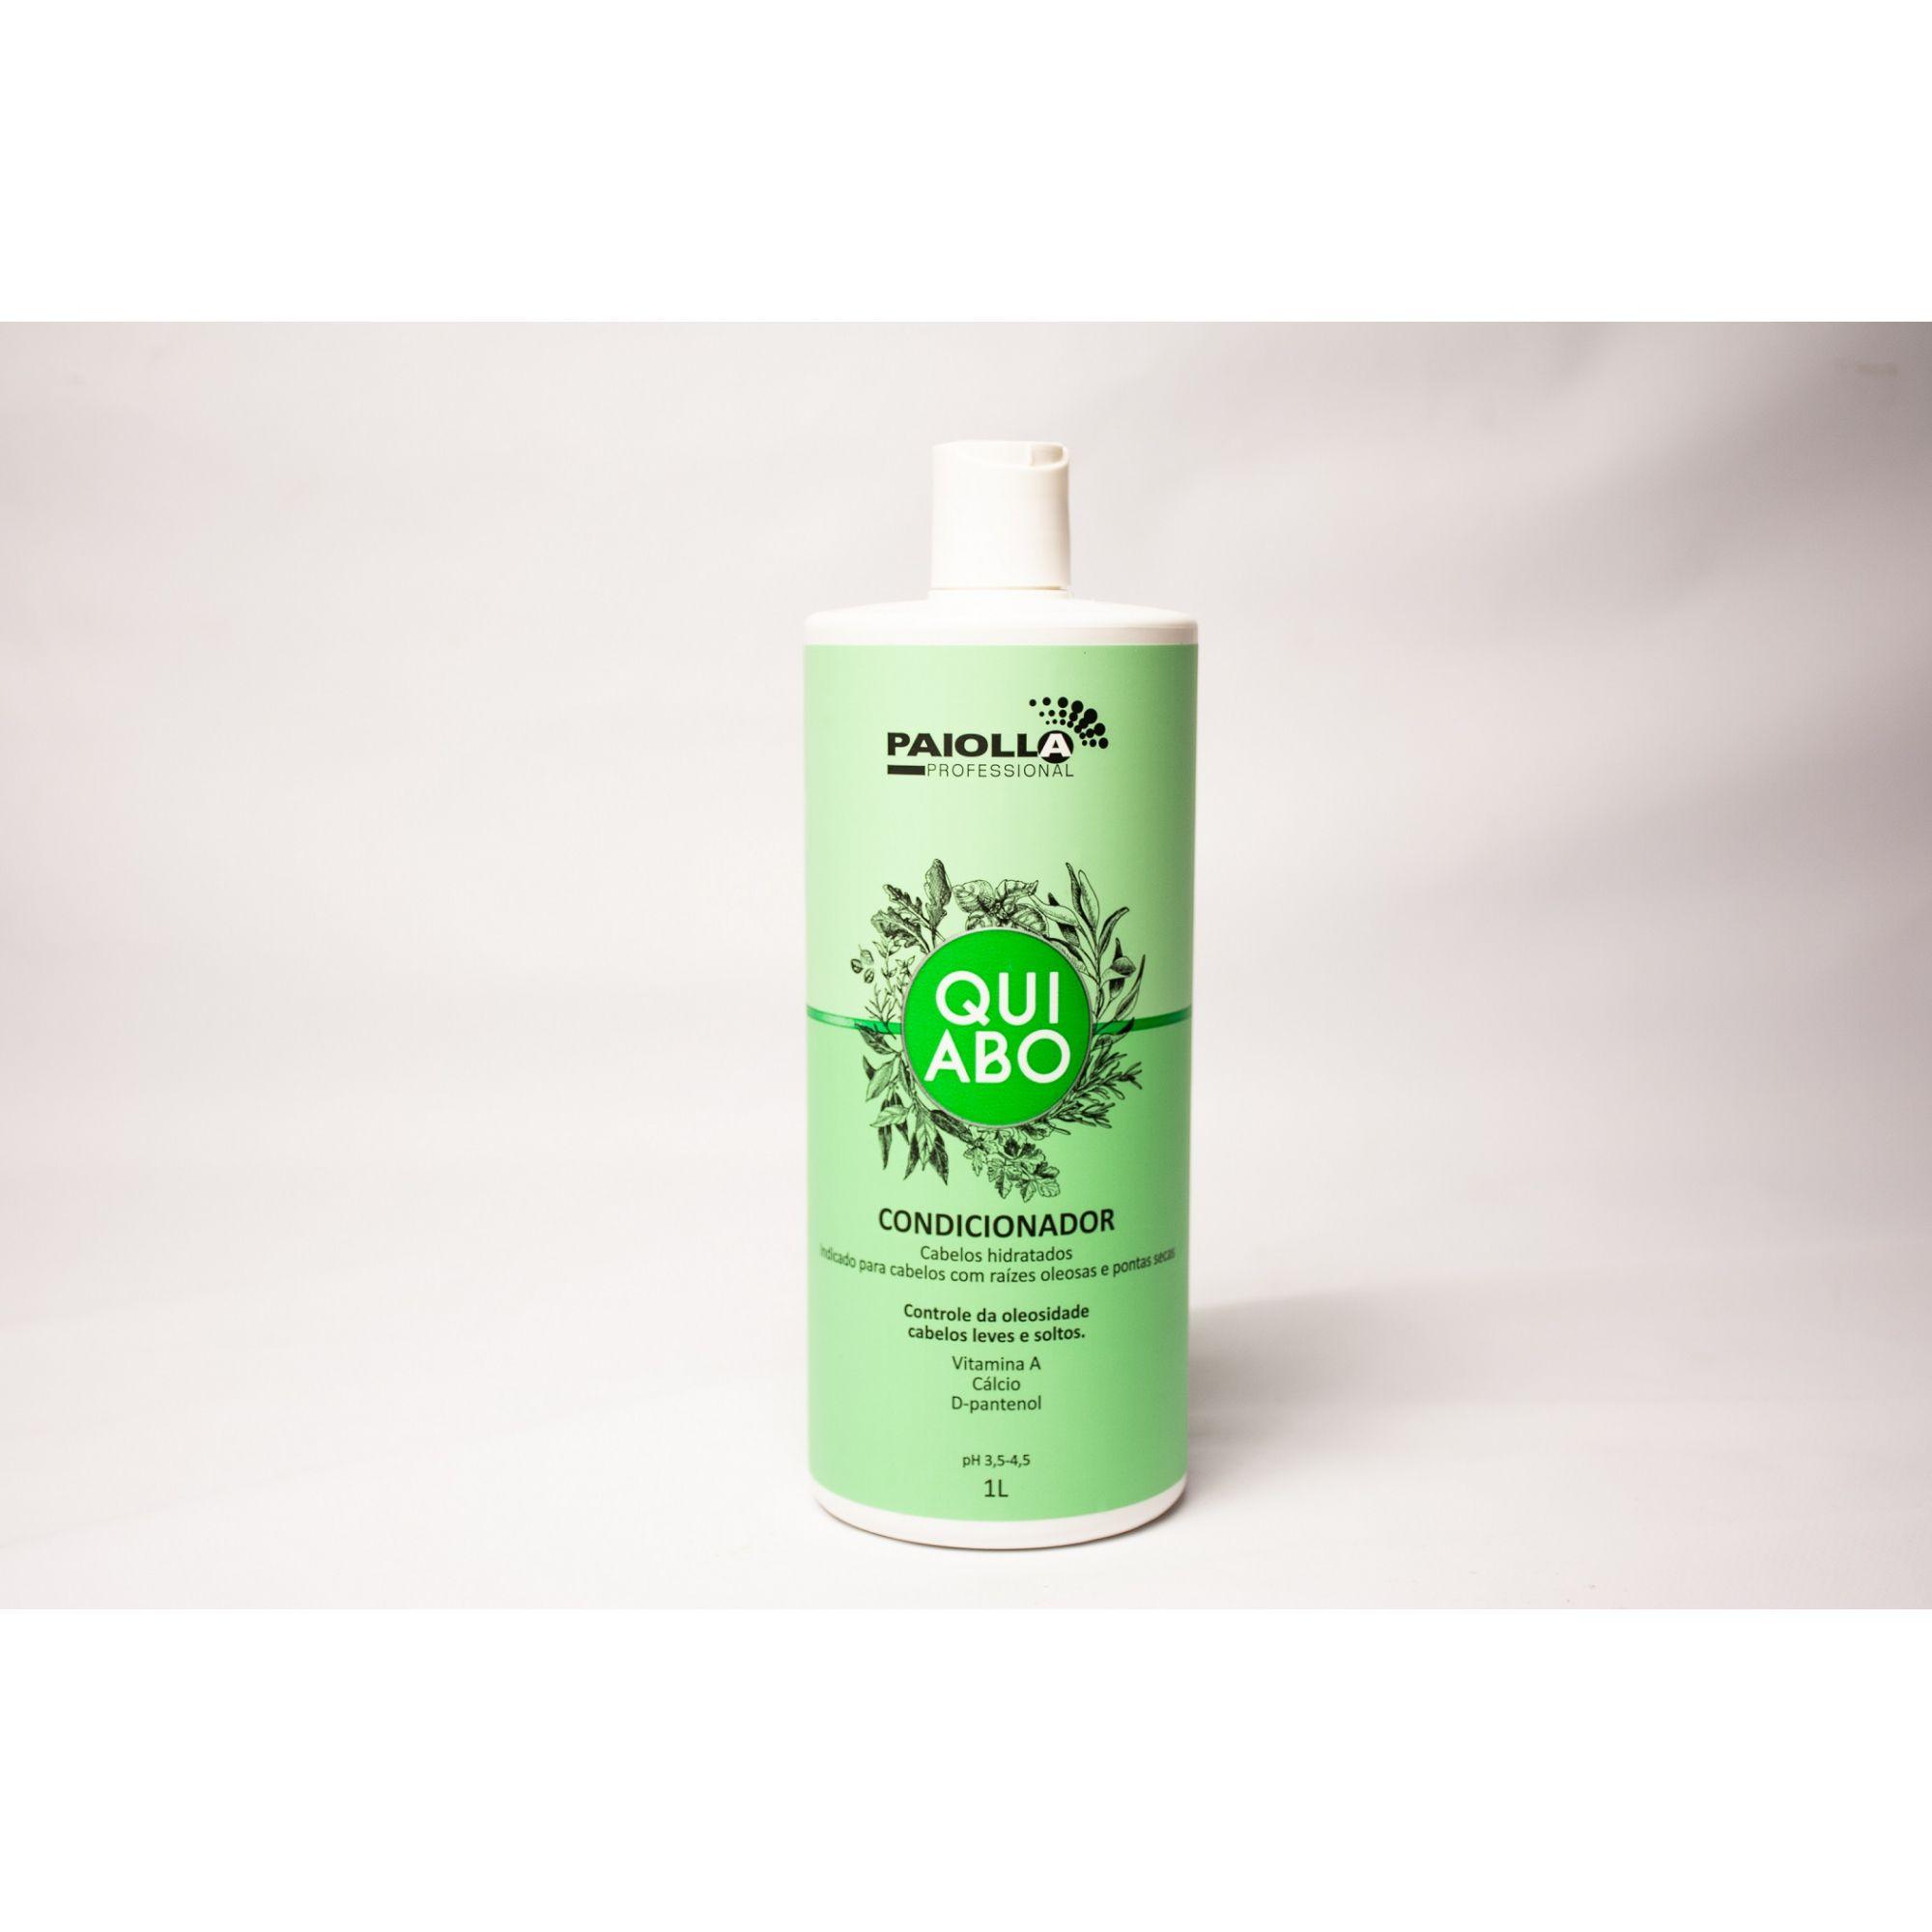 COMBO PROFISSIONAL Shampoo + Condicionador Quiabo